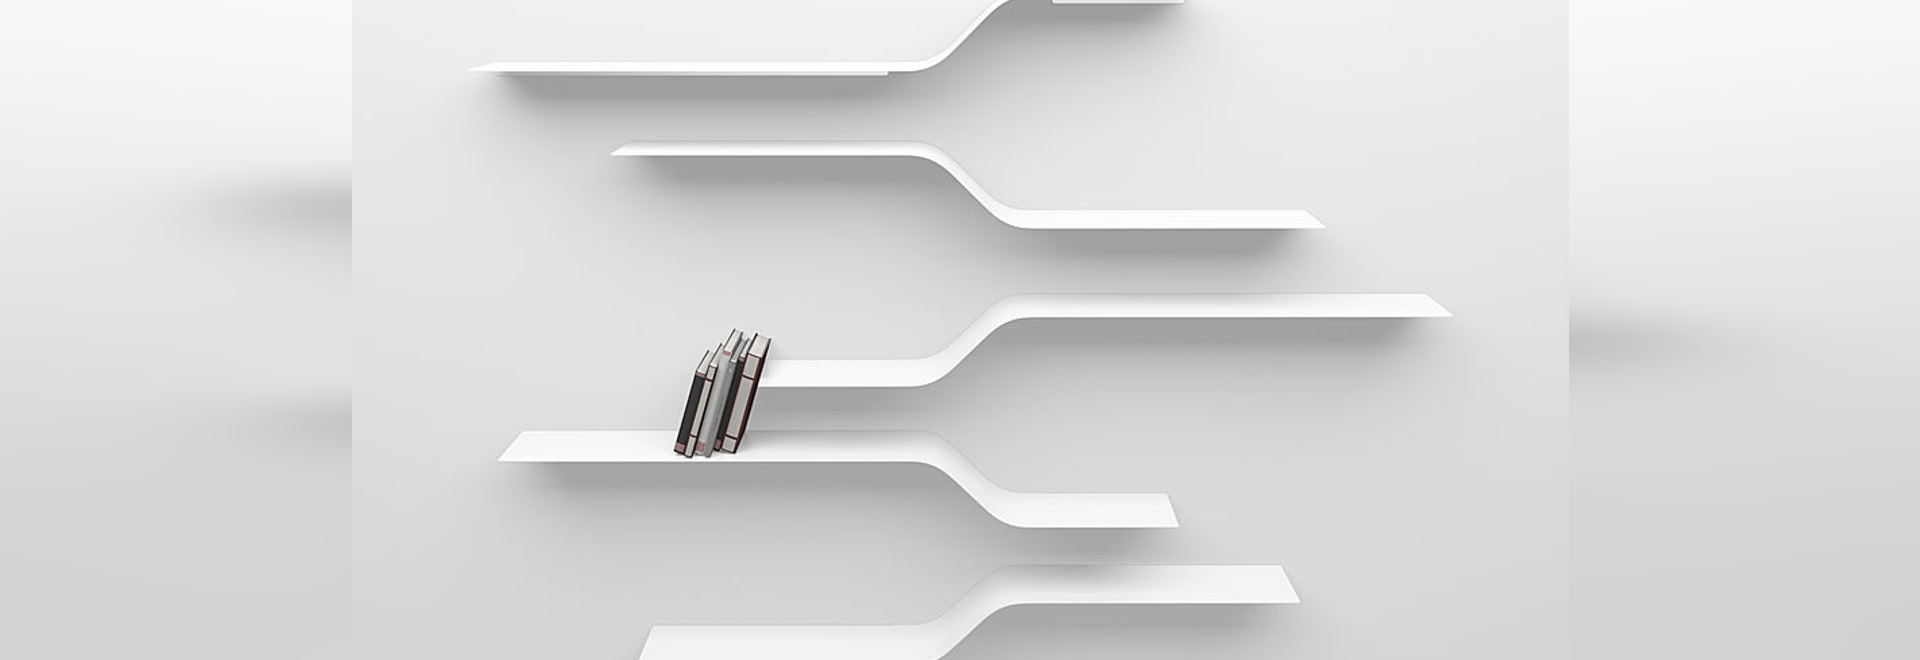 Mensole modulari a parete - VIDAME CREATION